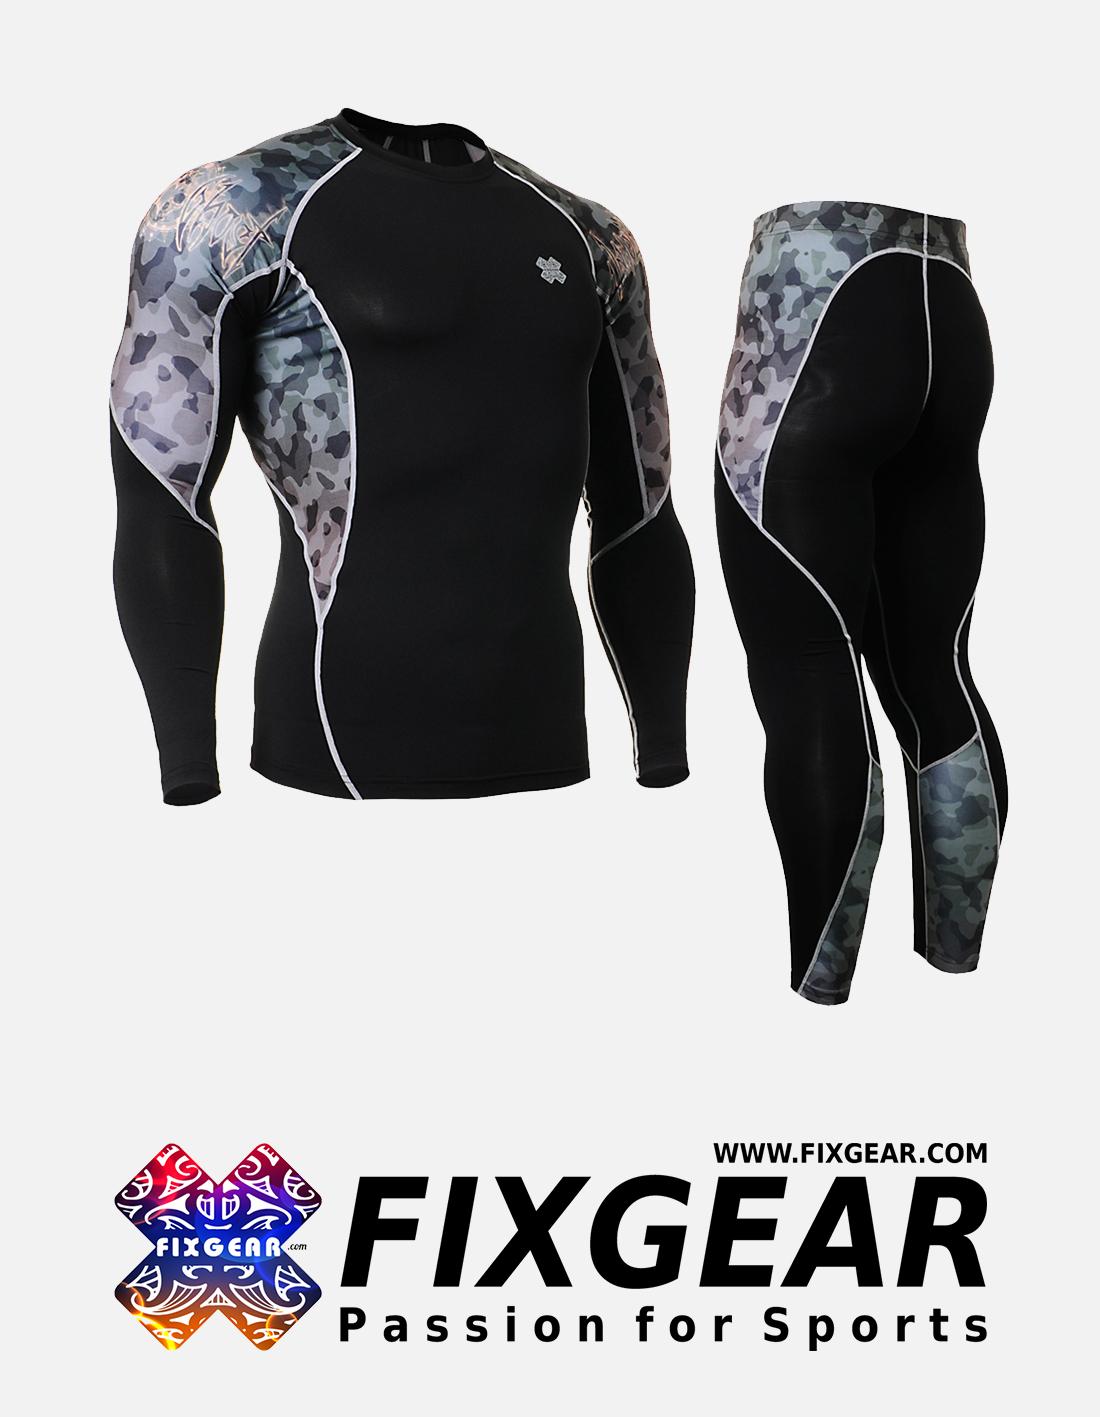 FIXGEAR C2L-P2L-B45 Set Compression Base Layer Shirt & Legging Pants